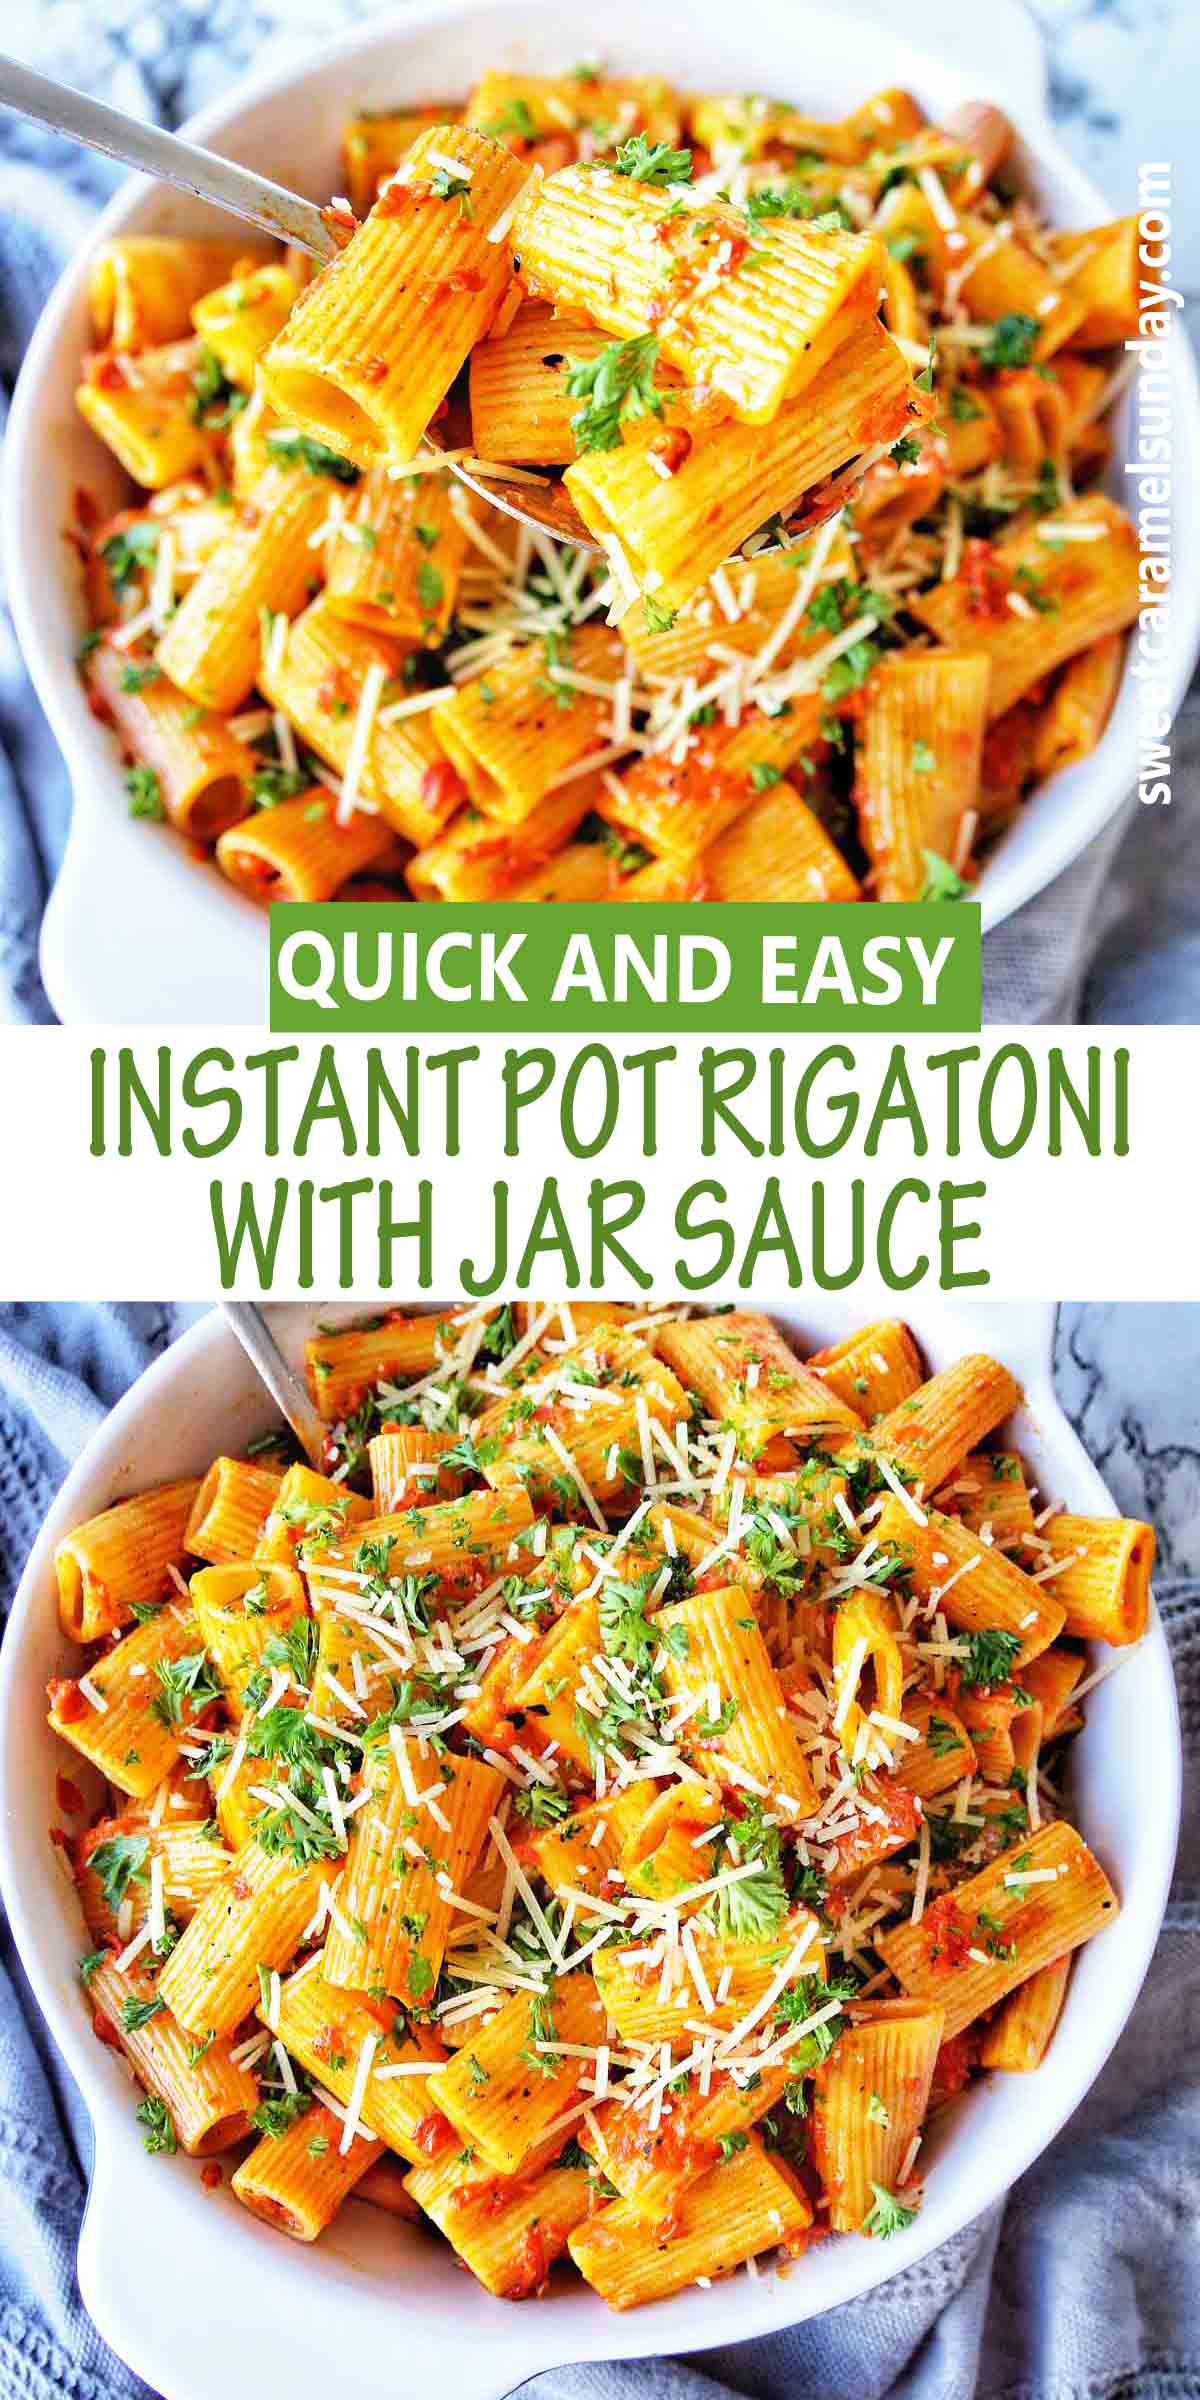 Instant Pot Rigatoni with Jar Sauce